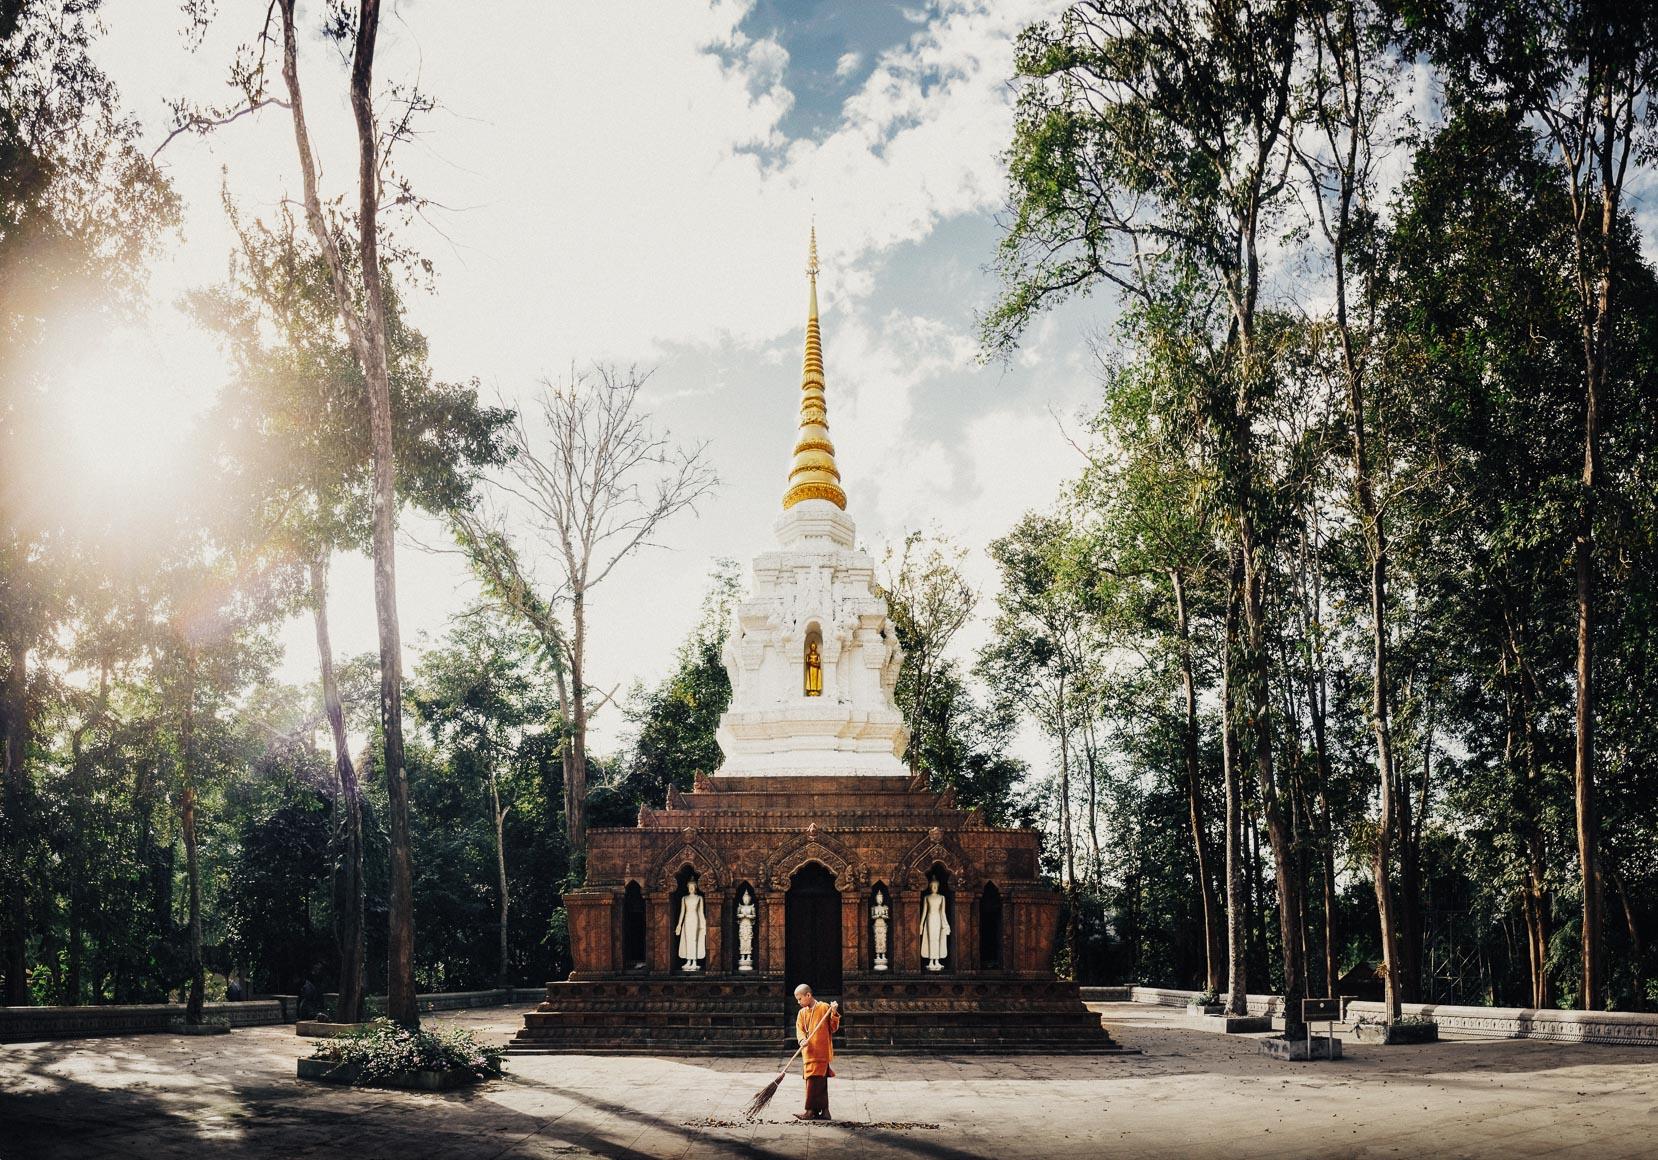 Temple_Composite.jpg